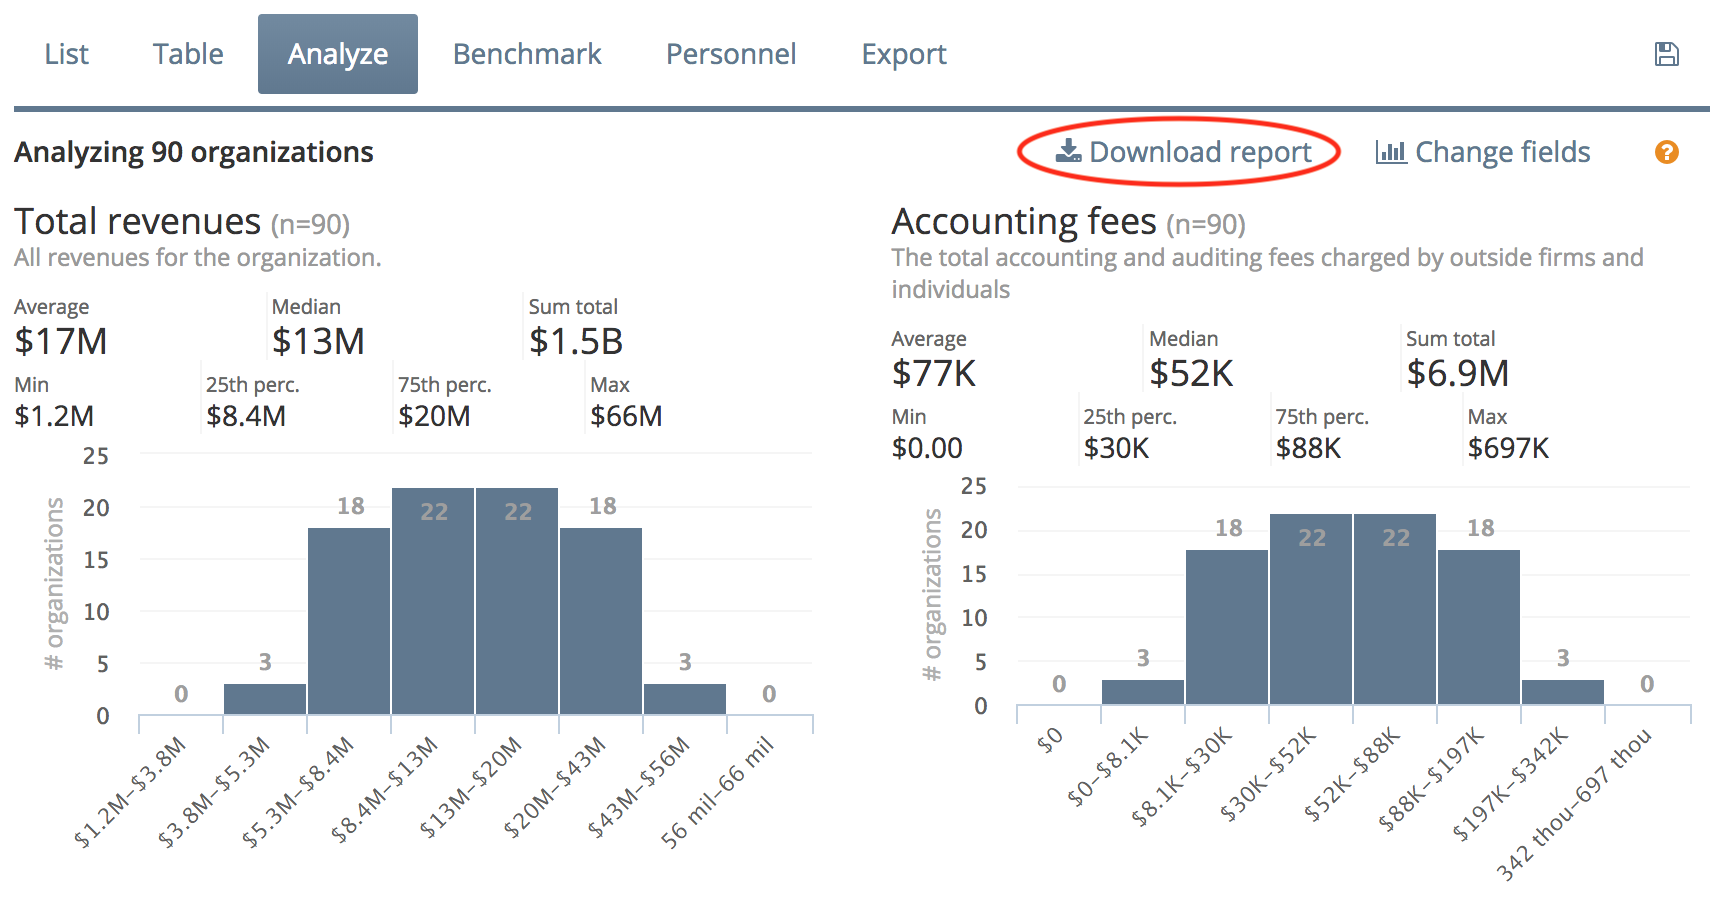 Download market analysis reports